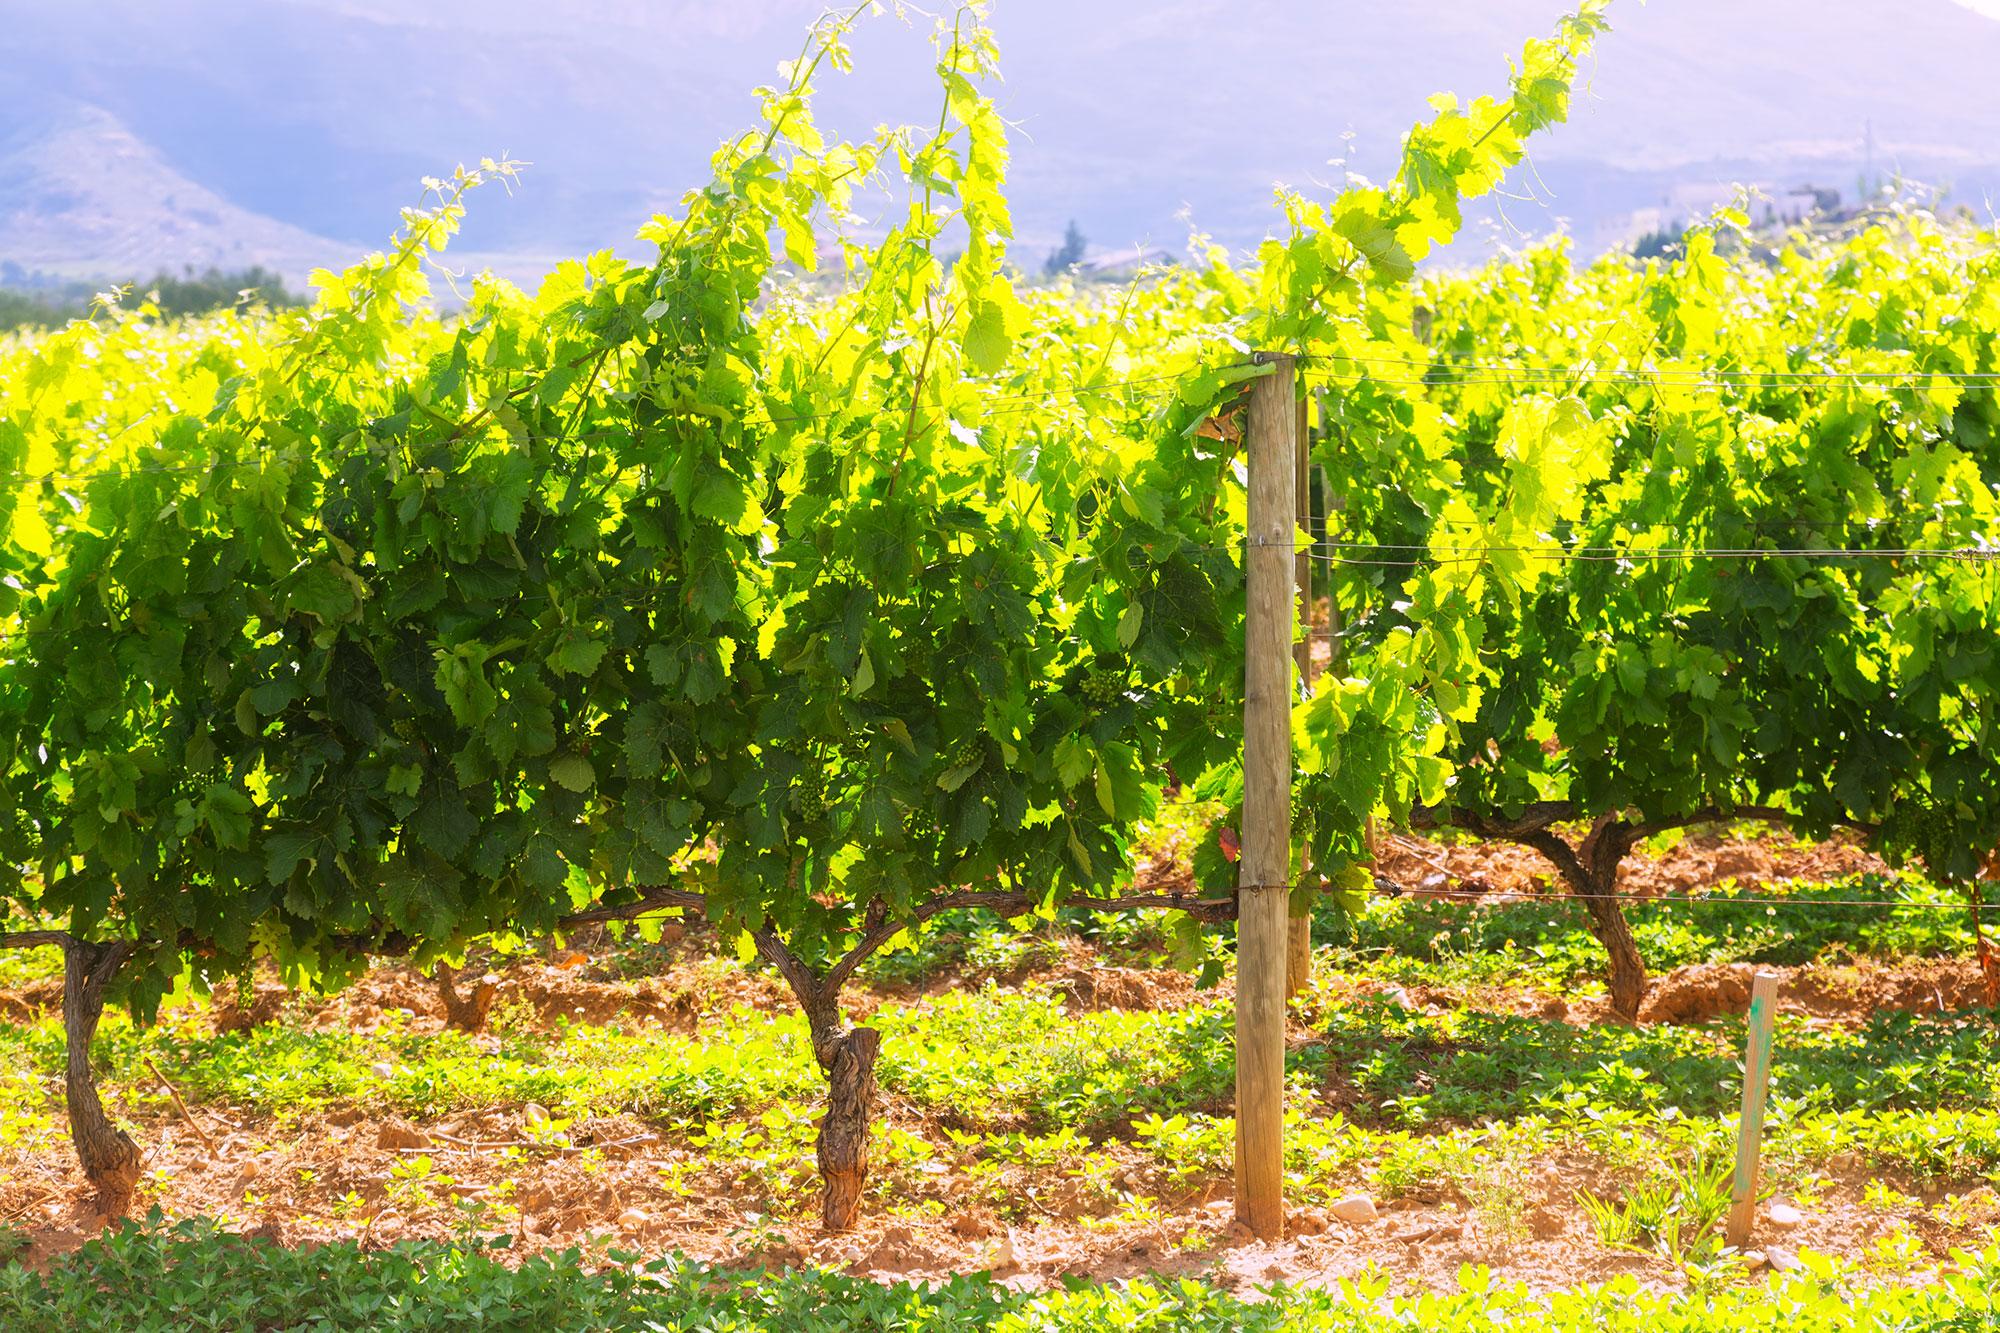 El otoño en la Selva de Irati y la Rioja alavesa - España- imagen #3